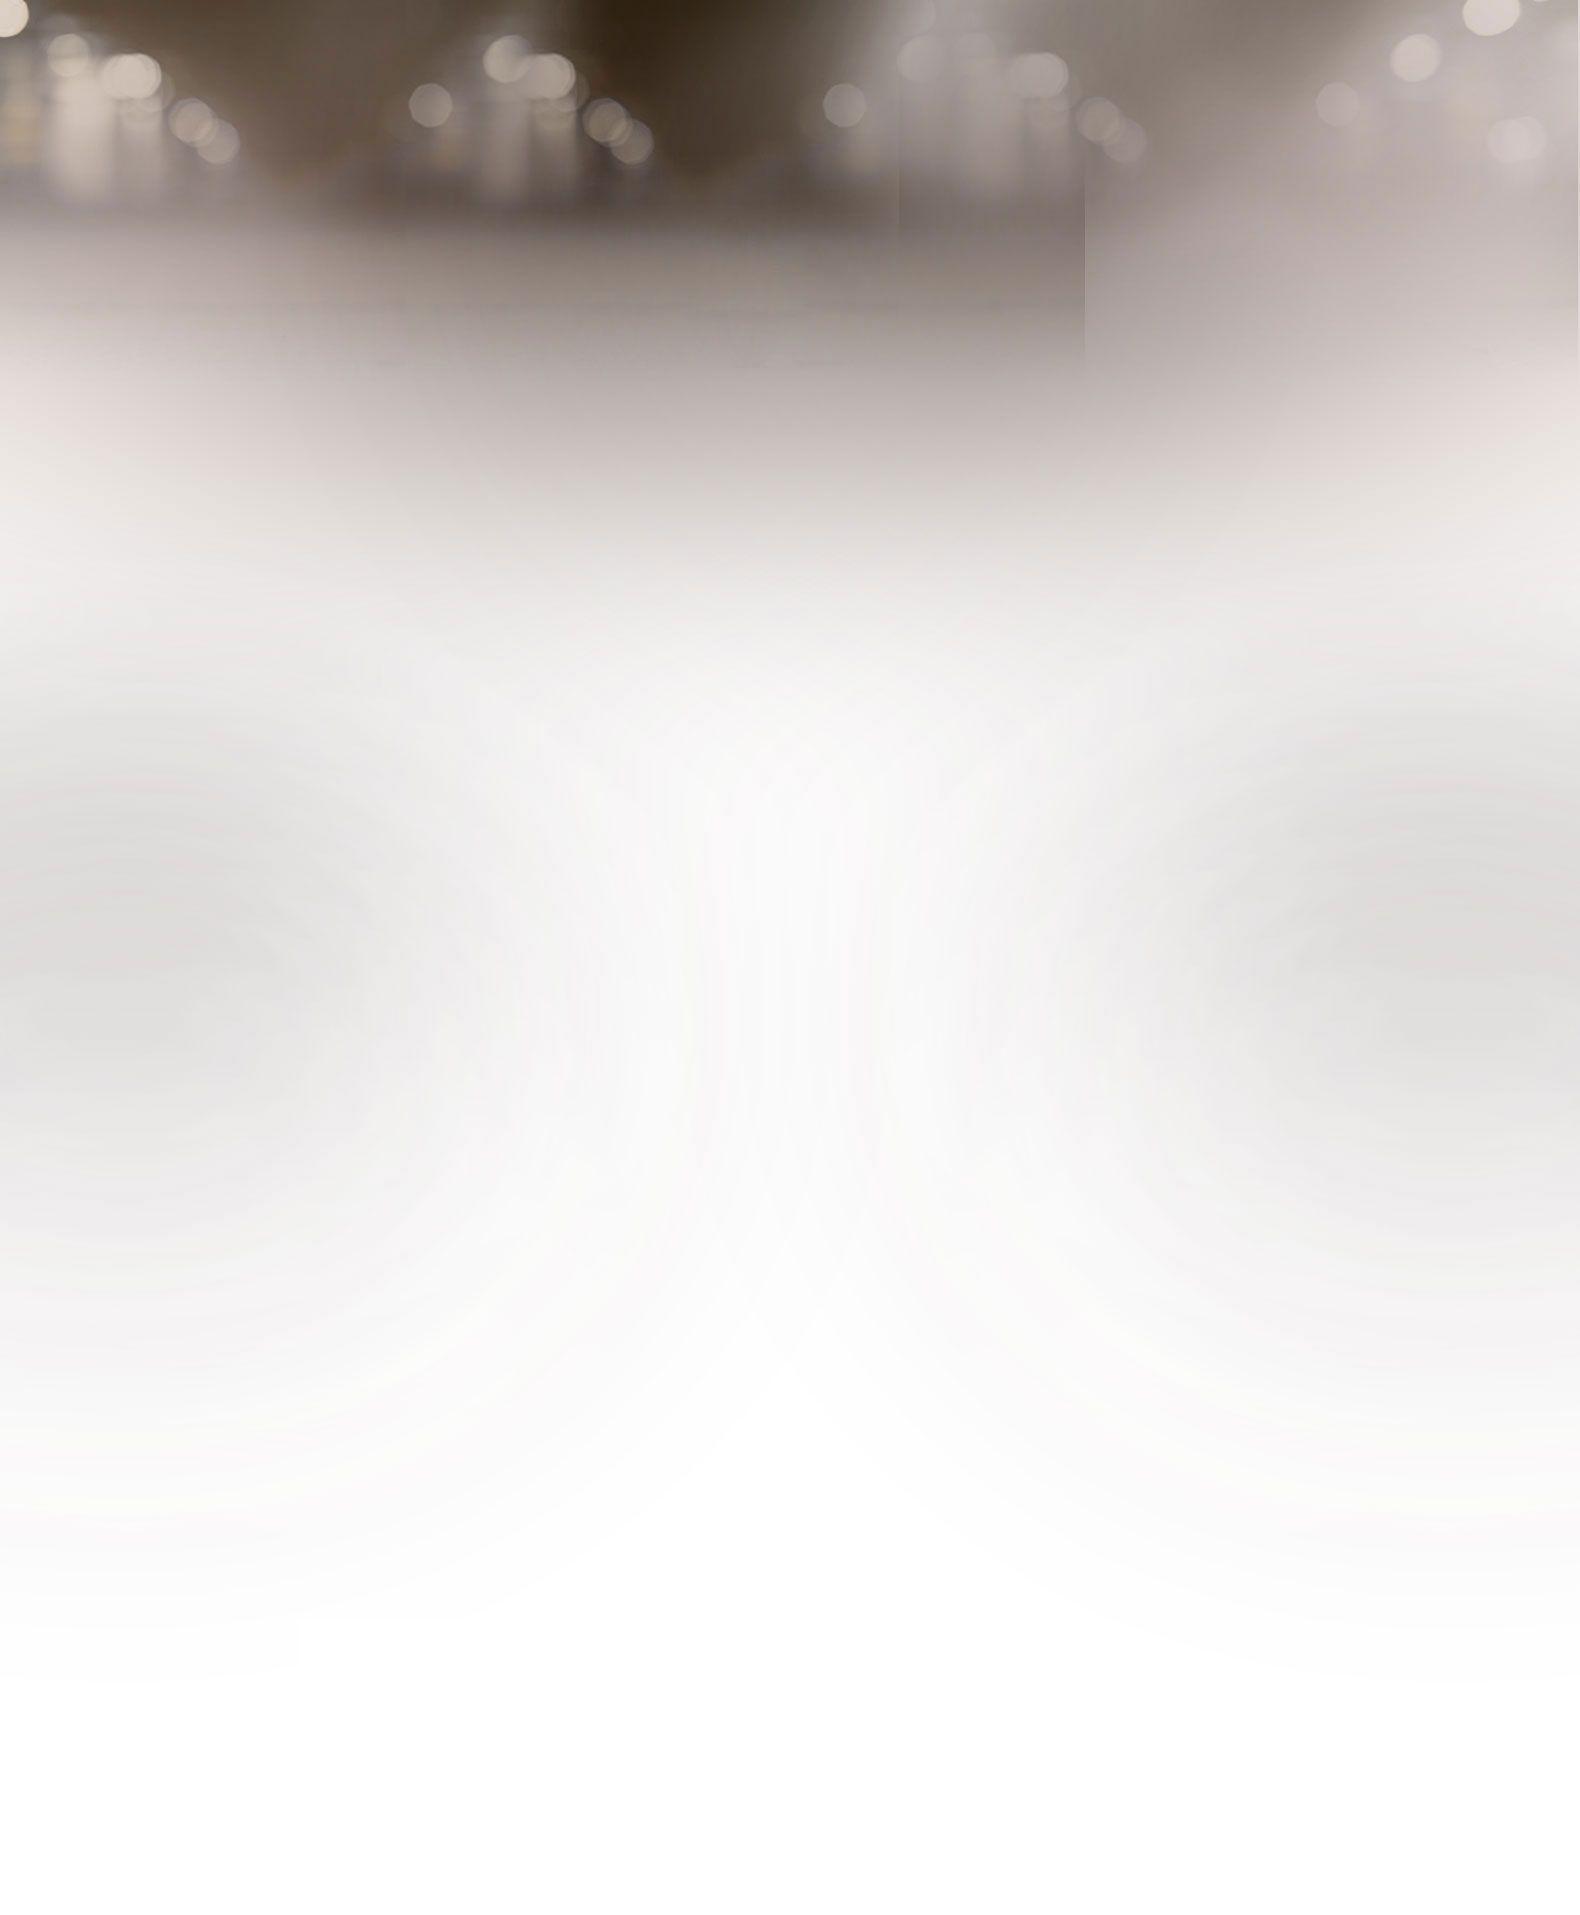 a7324b2876f1 Discount Coupon   Louis Vuitton Outlet